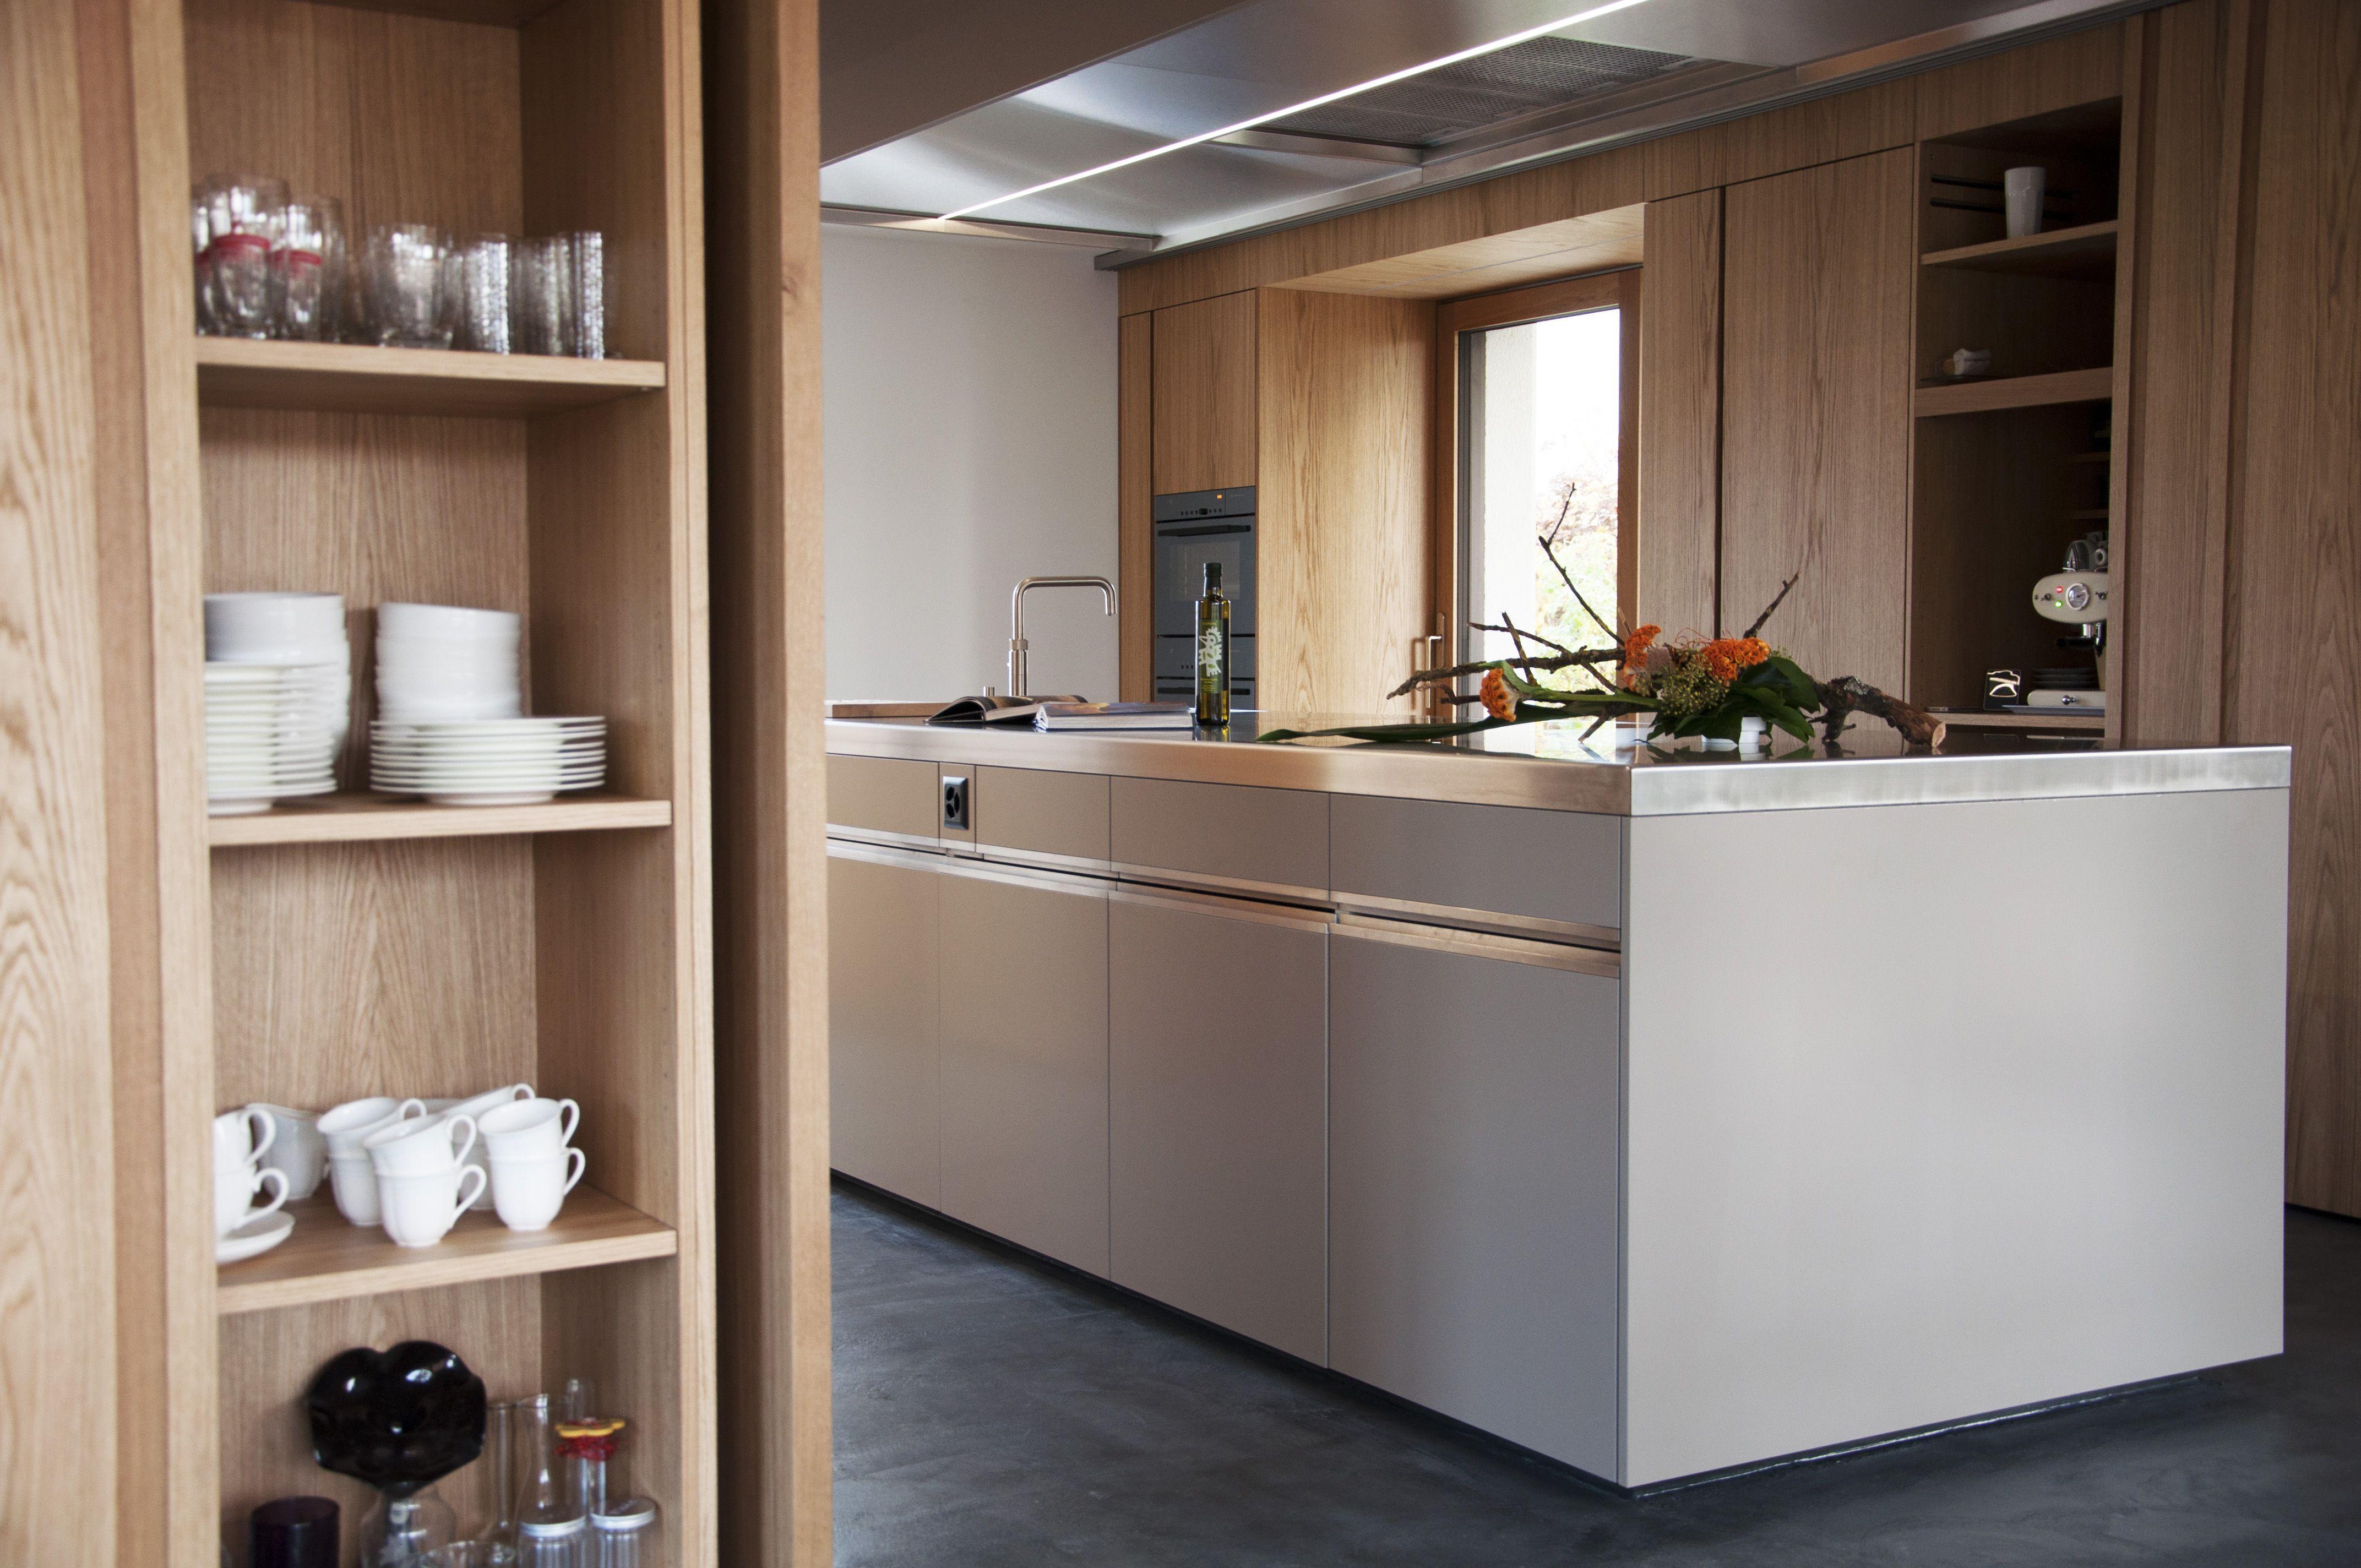 Fein Maßgeschneiderte Küchenschränke Sydney Ideen - Küche Set Ideen ...